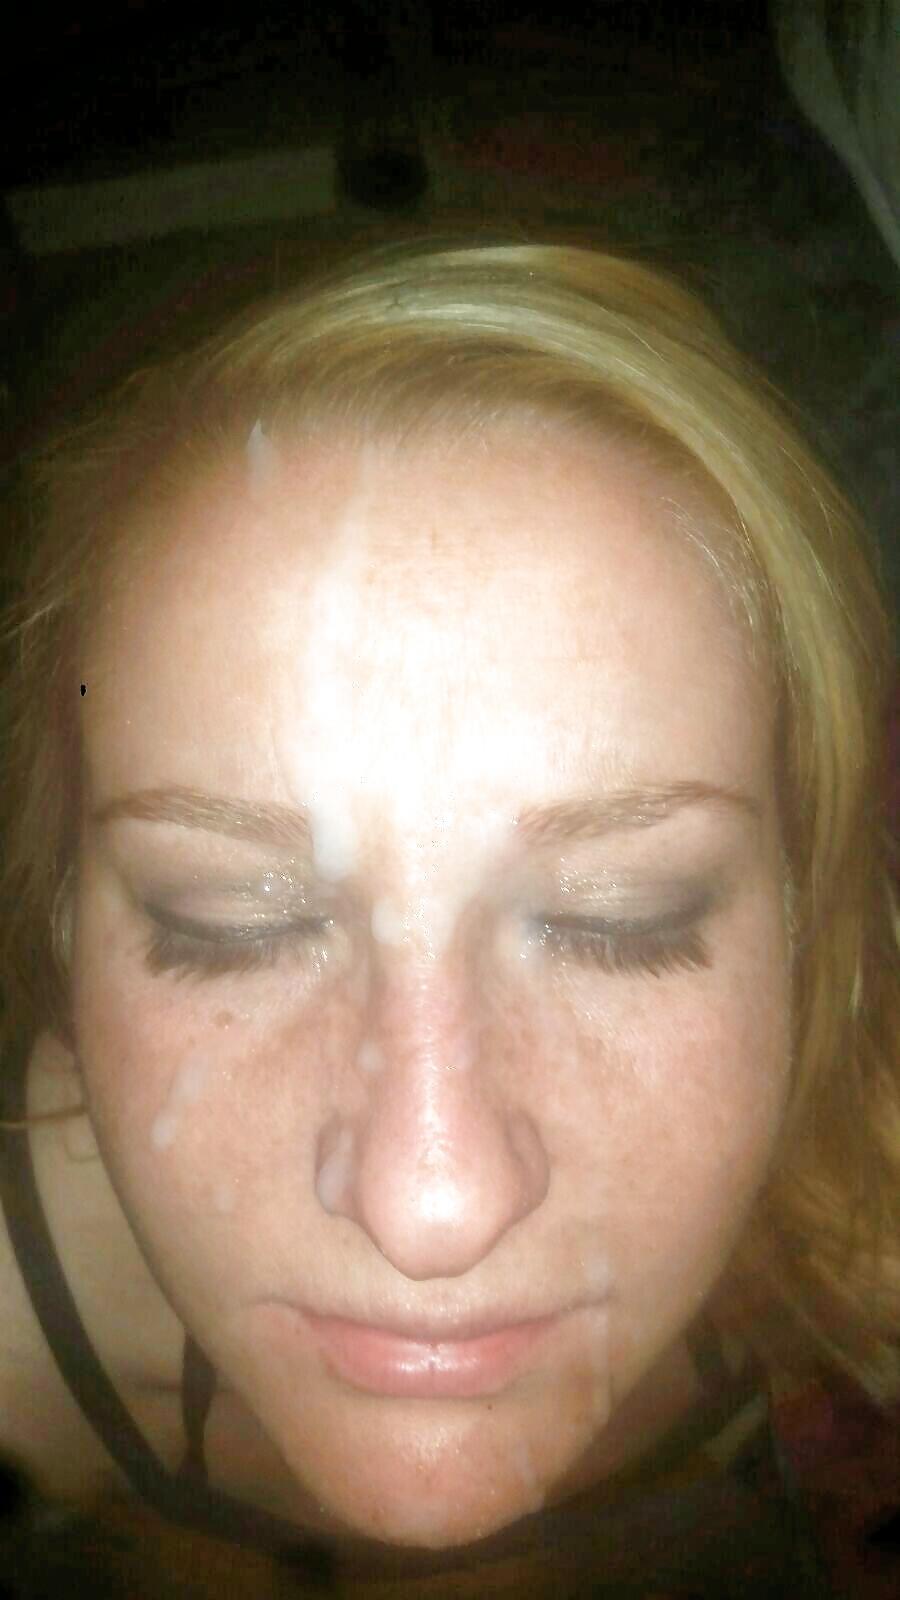 maman salopes du 33 à baiser